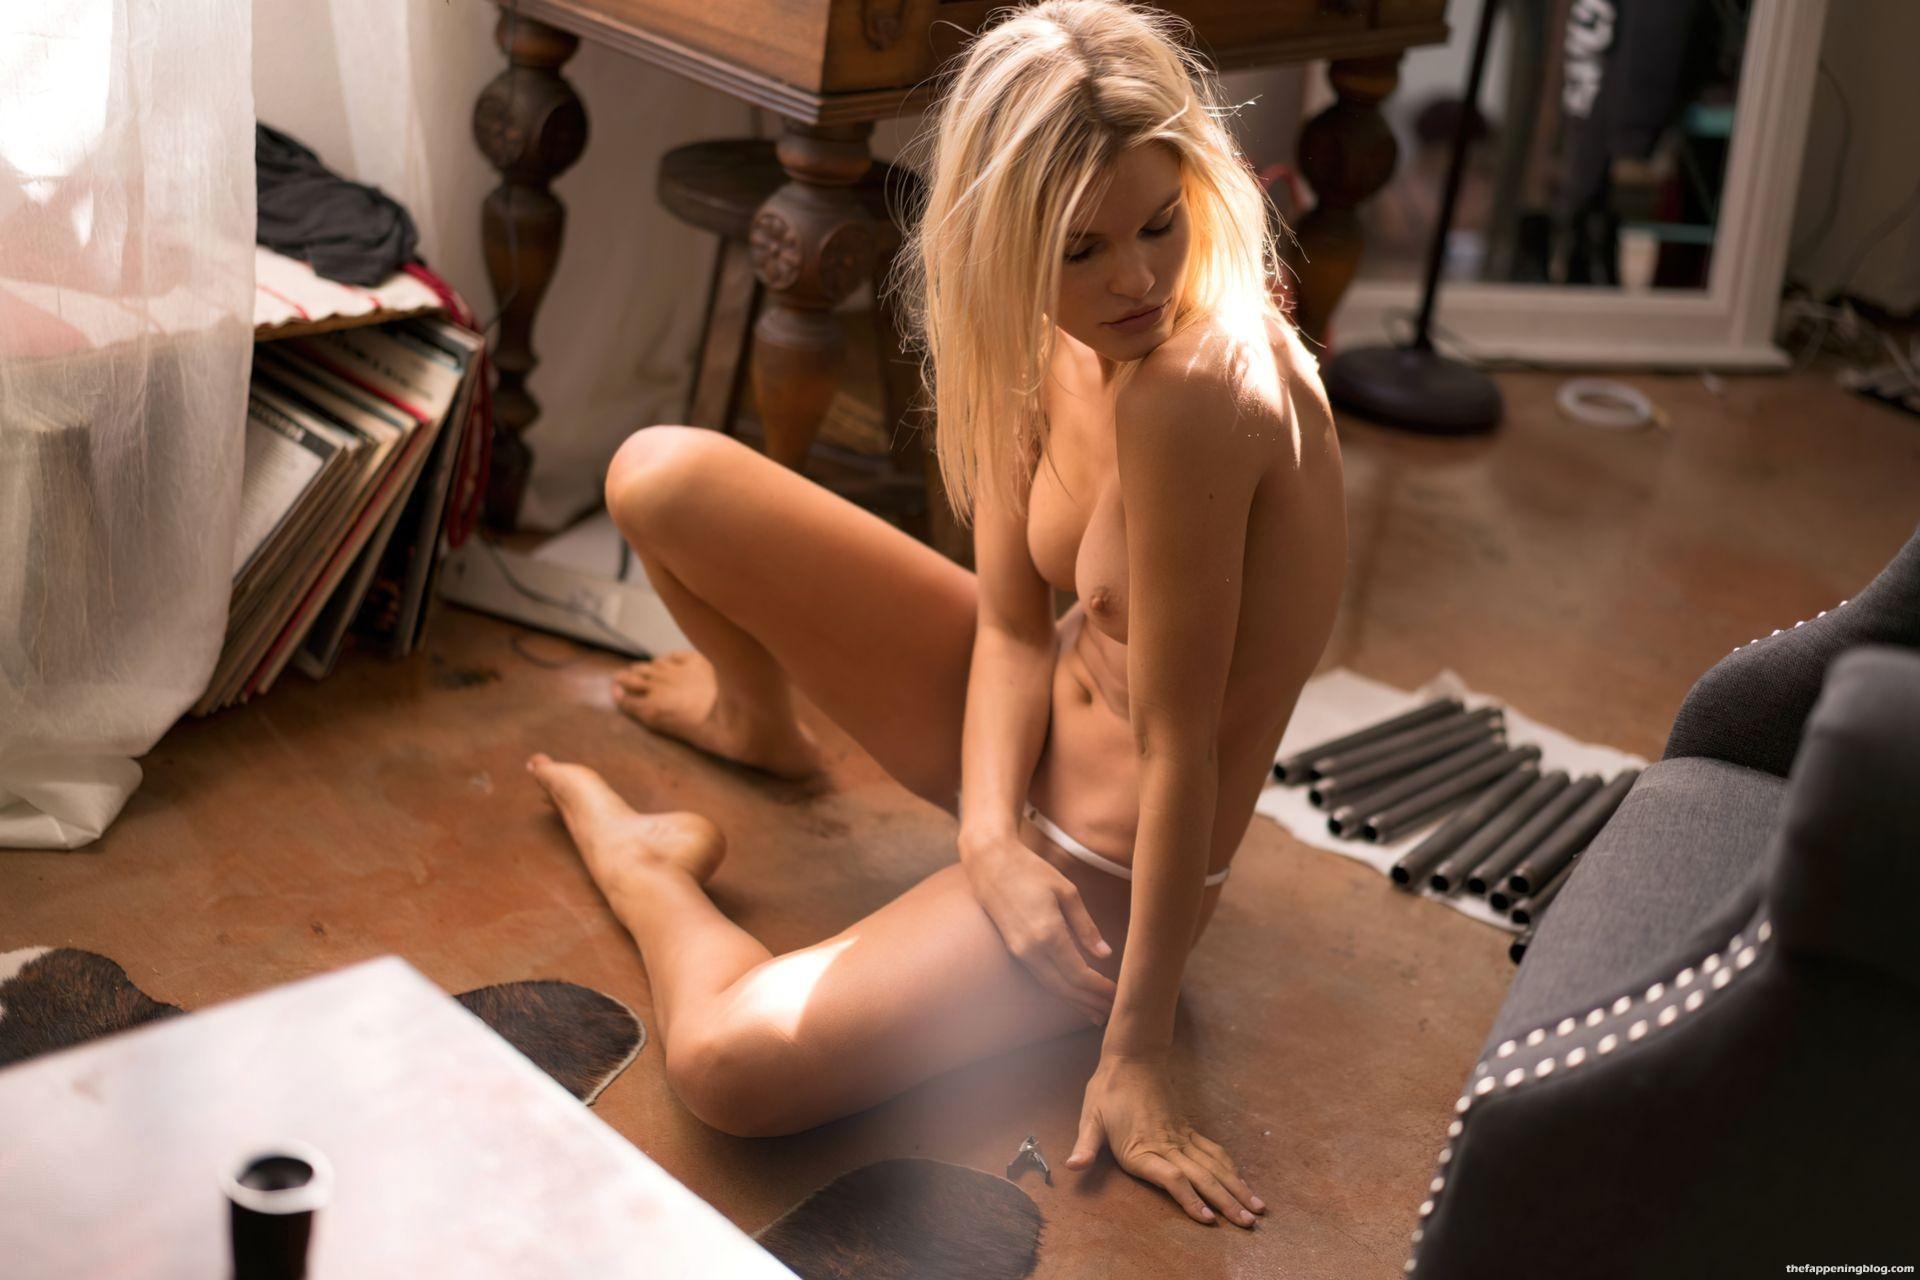 Joy-Corrigan-Naked-Tits-and-Ass-231-thefappeningblog.com_.jpg